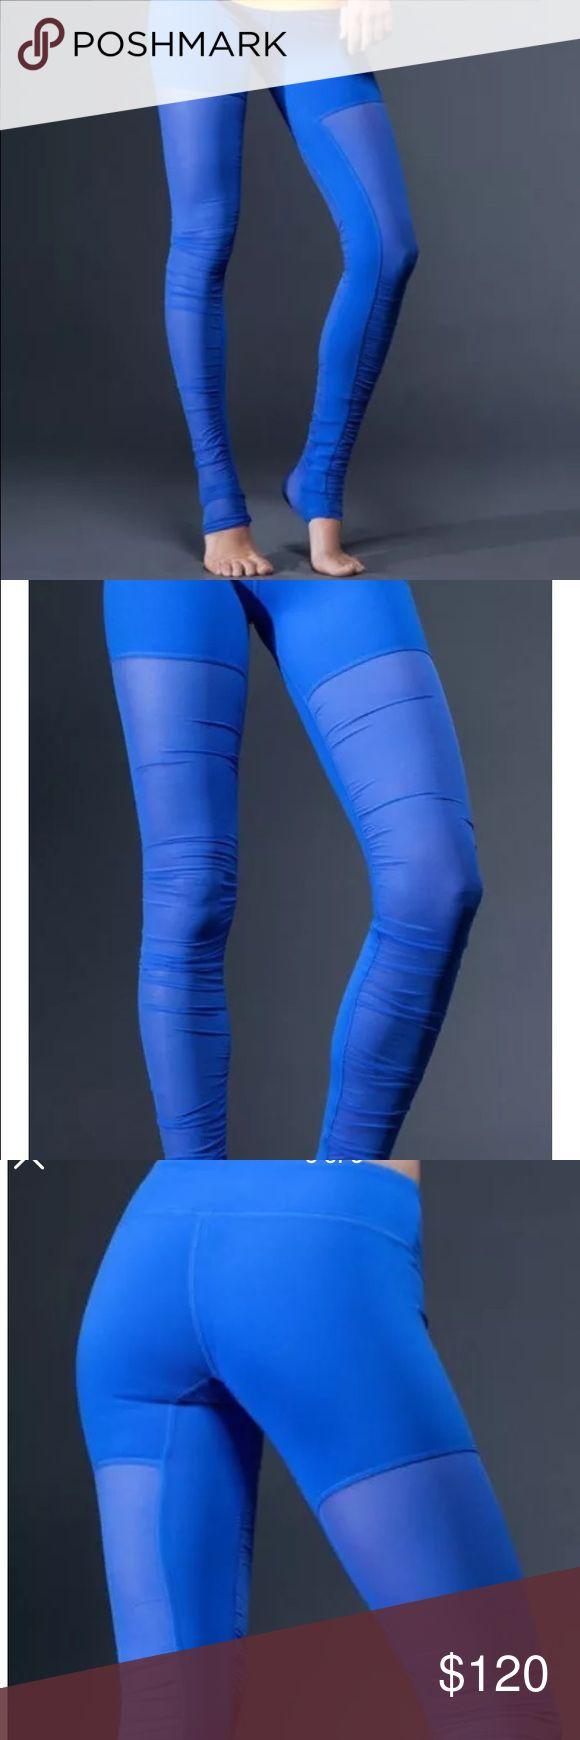 Alo goddess leggings NWT bright blue yoga large L New with tags bright blue mesh legging. Alo yoga. Alo goddess leggings  size large ALO Yoga Pants Leggings